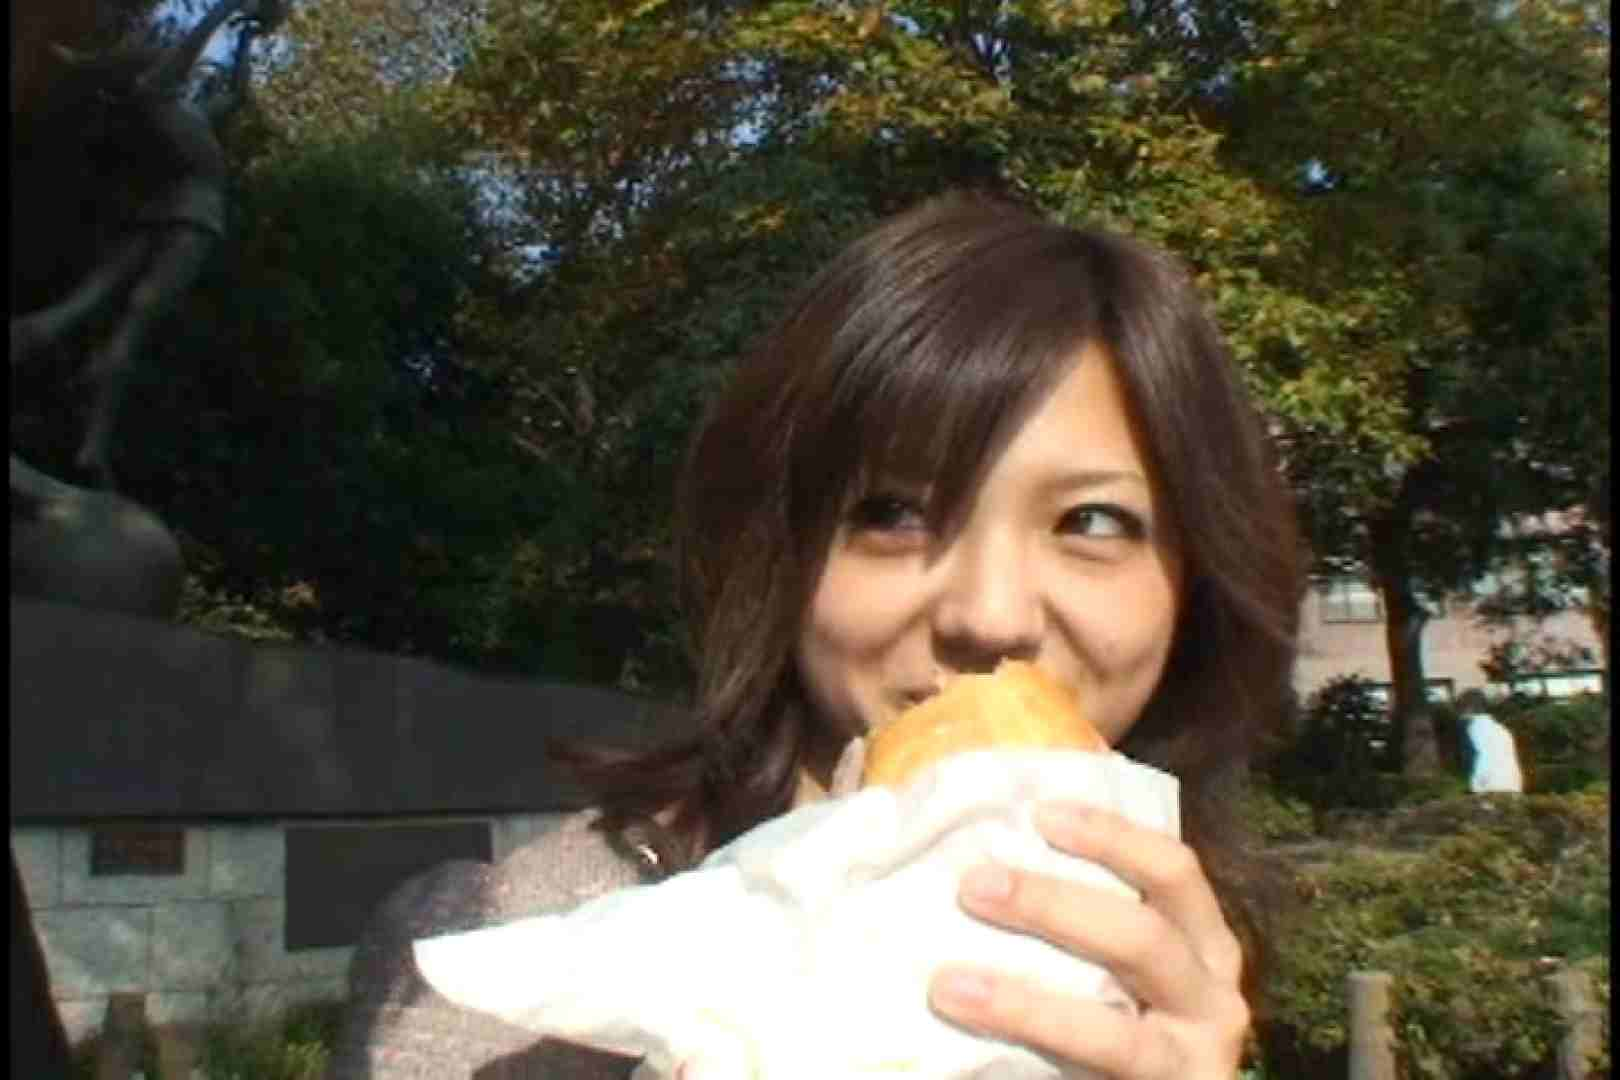 JDハンター全国ツアー vol.035 前編 女子大生のエロ動画  110PIX 34